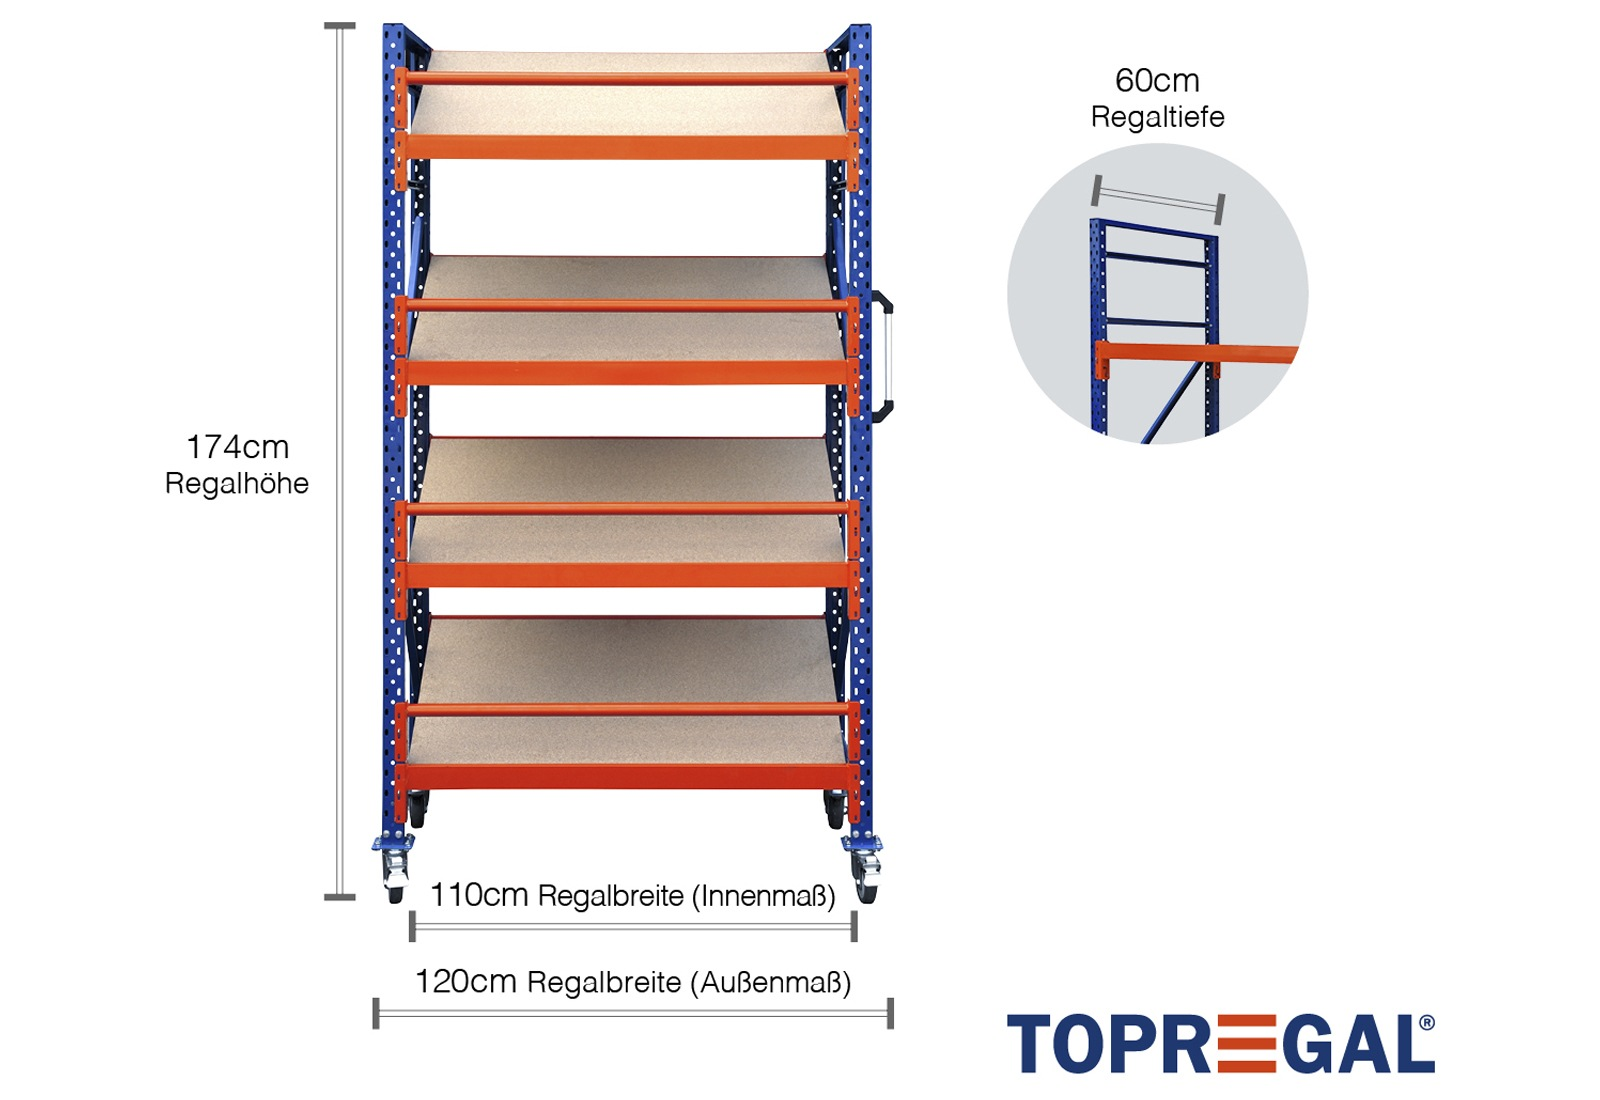 lagerregal fahrbar 1 2m breit mit 4 ebenen inkl schr gb den 60cm tief regalh he 174cm. Black Bedroom Furniture Sets. Home Design Ideas